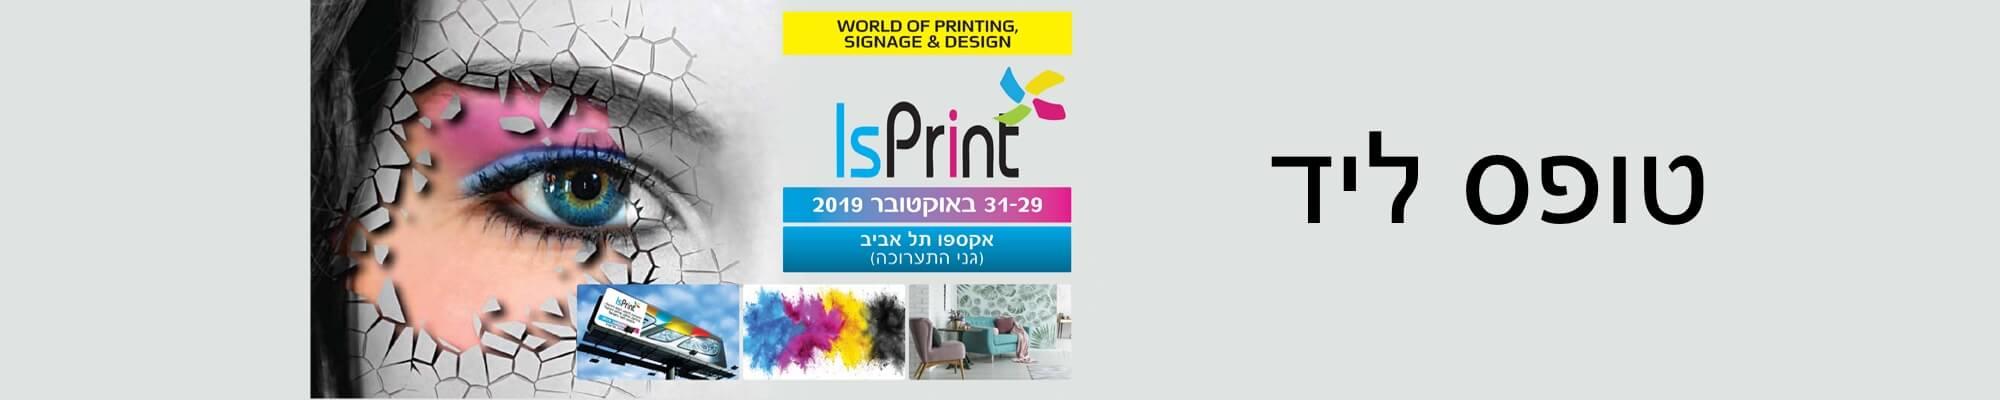 , isprint banner, גטר גרפיקס, מכונות דפוס אופסט, מדבקות, חומרים למכונות דפוס אופסט